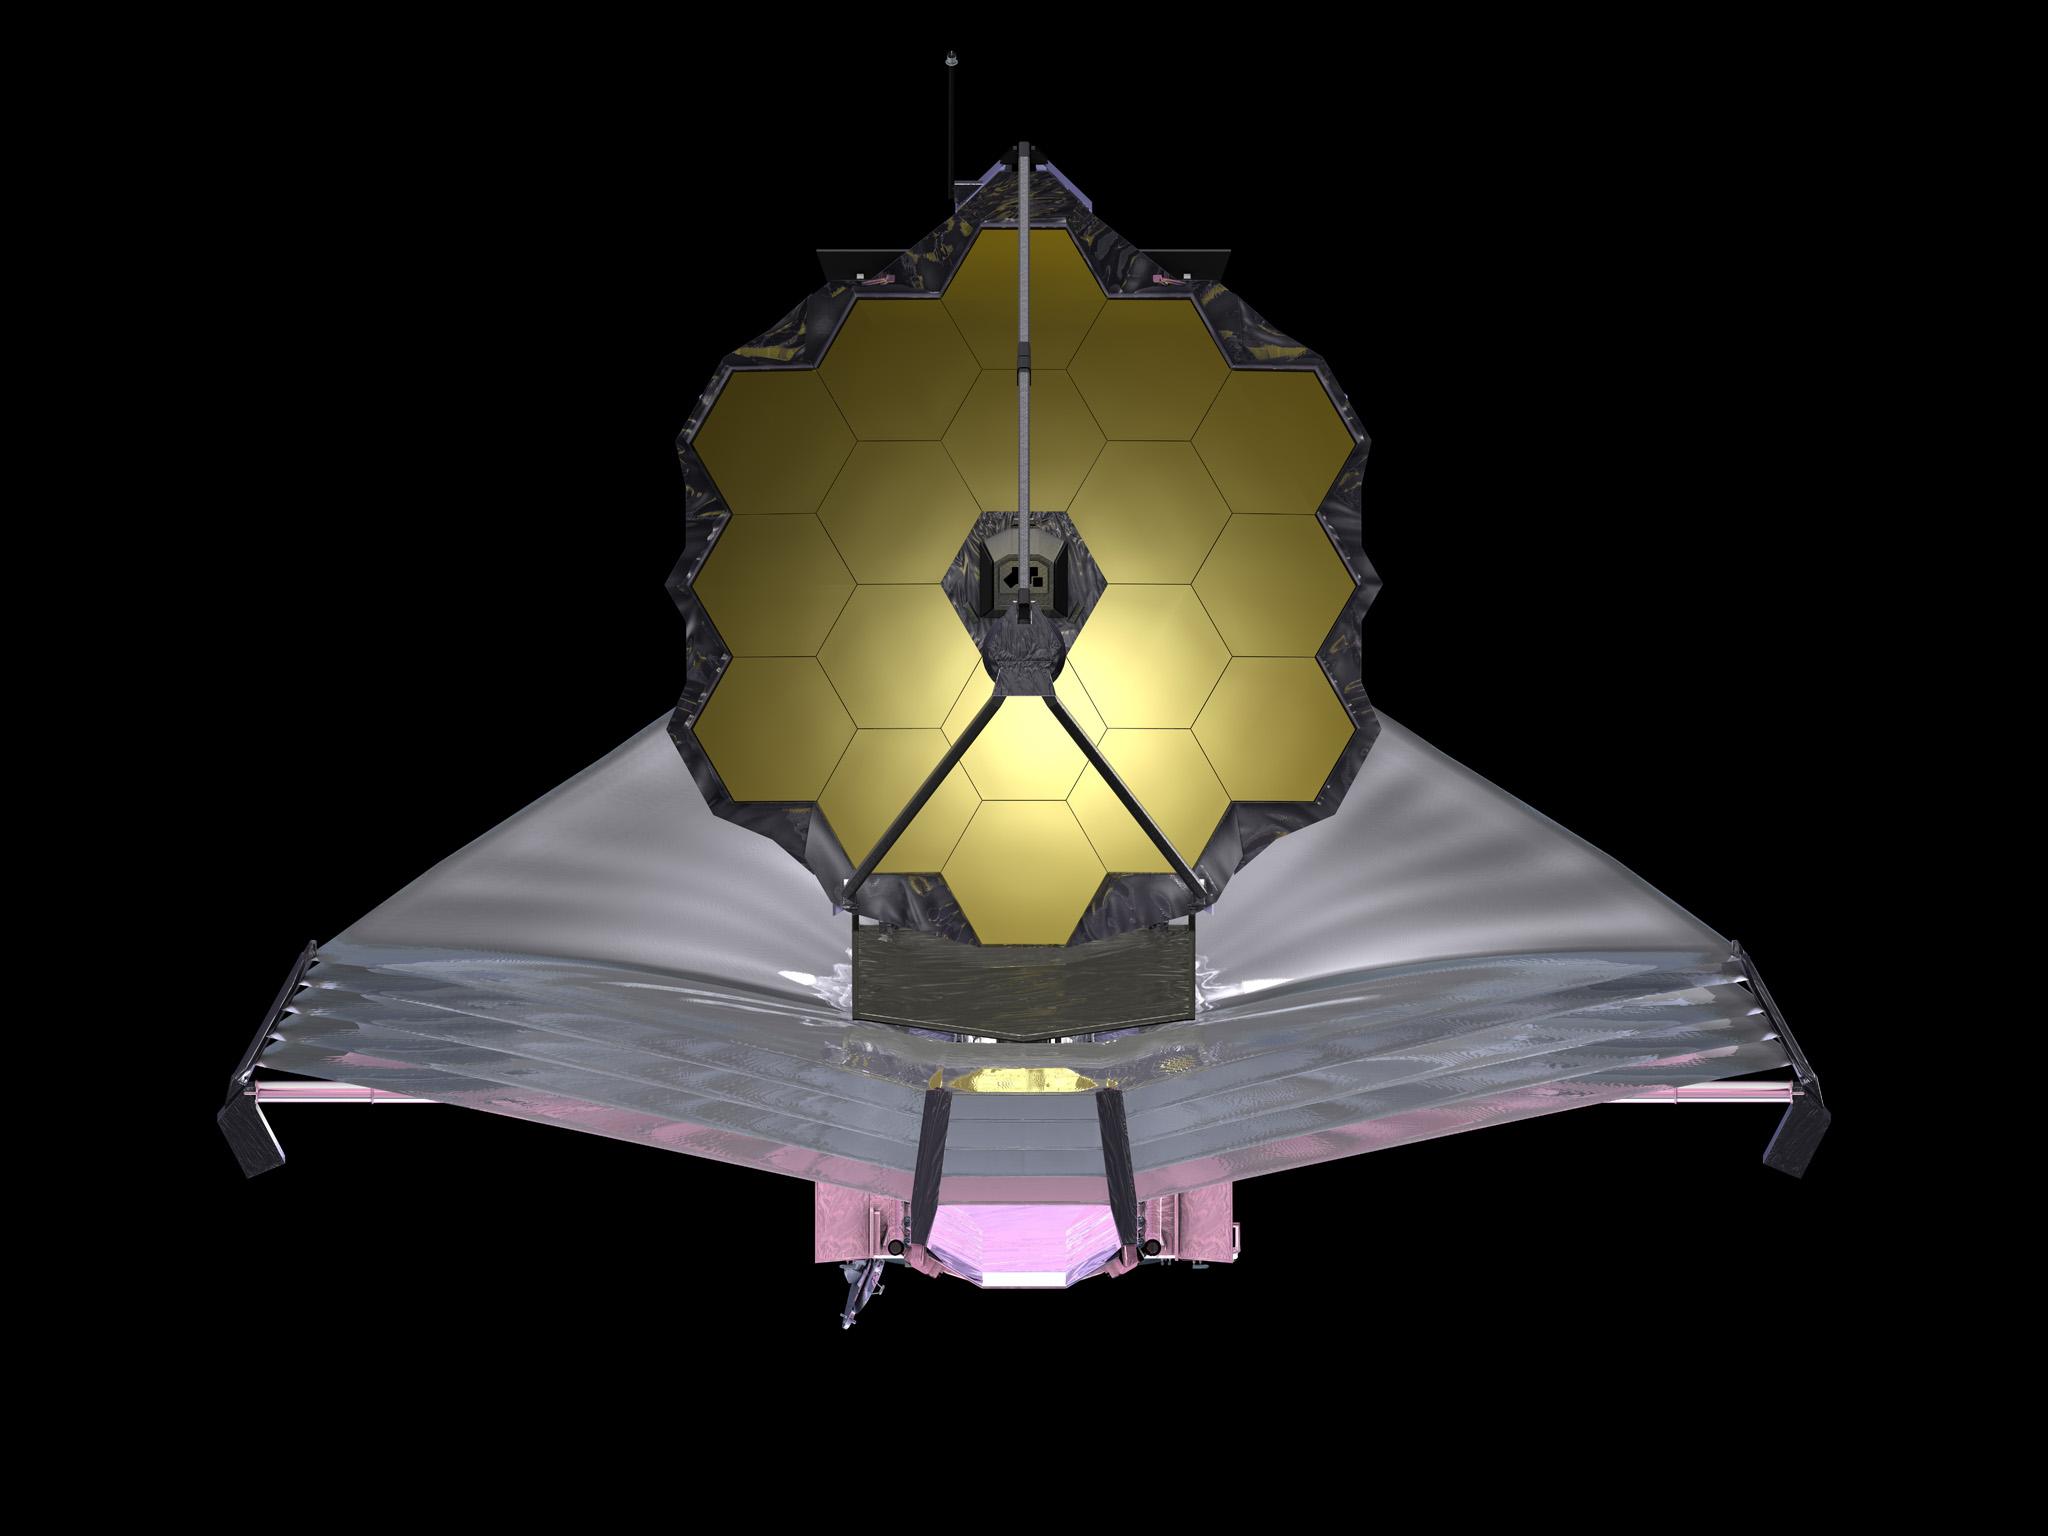 <p>An artist's rendering of the James Webb Telescope</p>